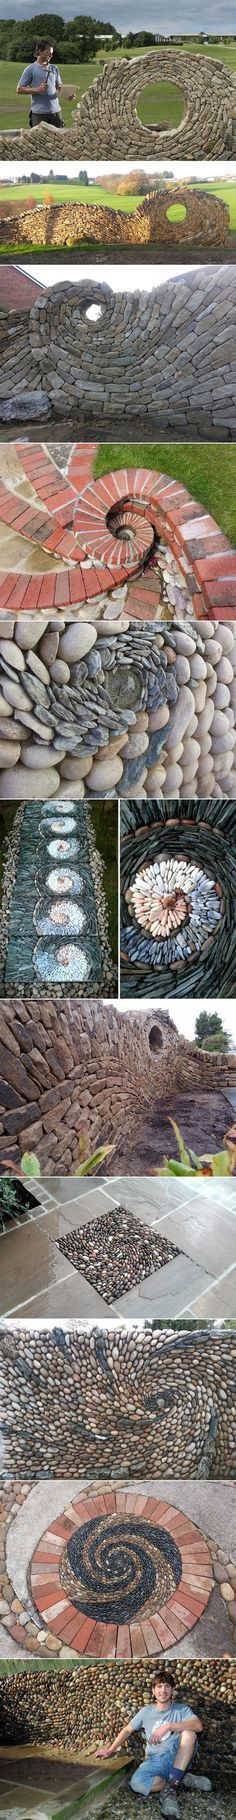 Cool walls - Imgur